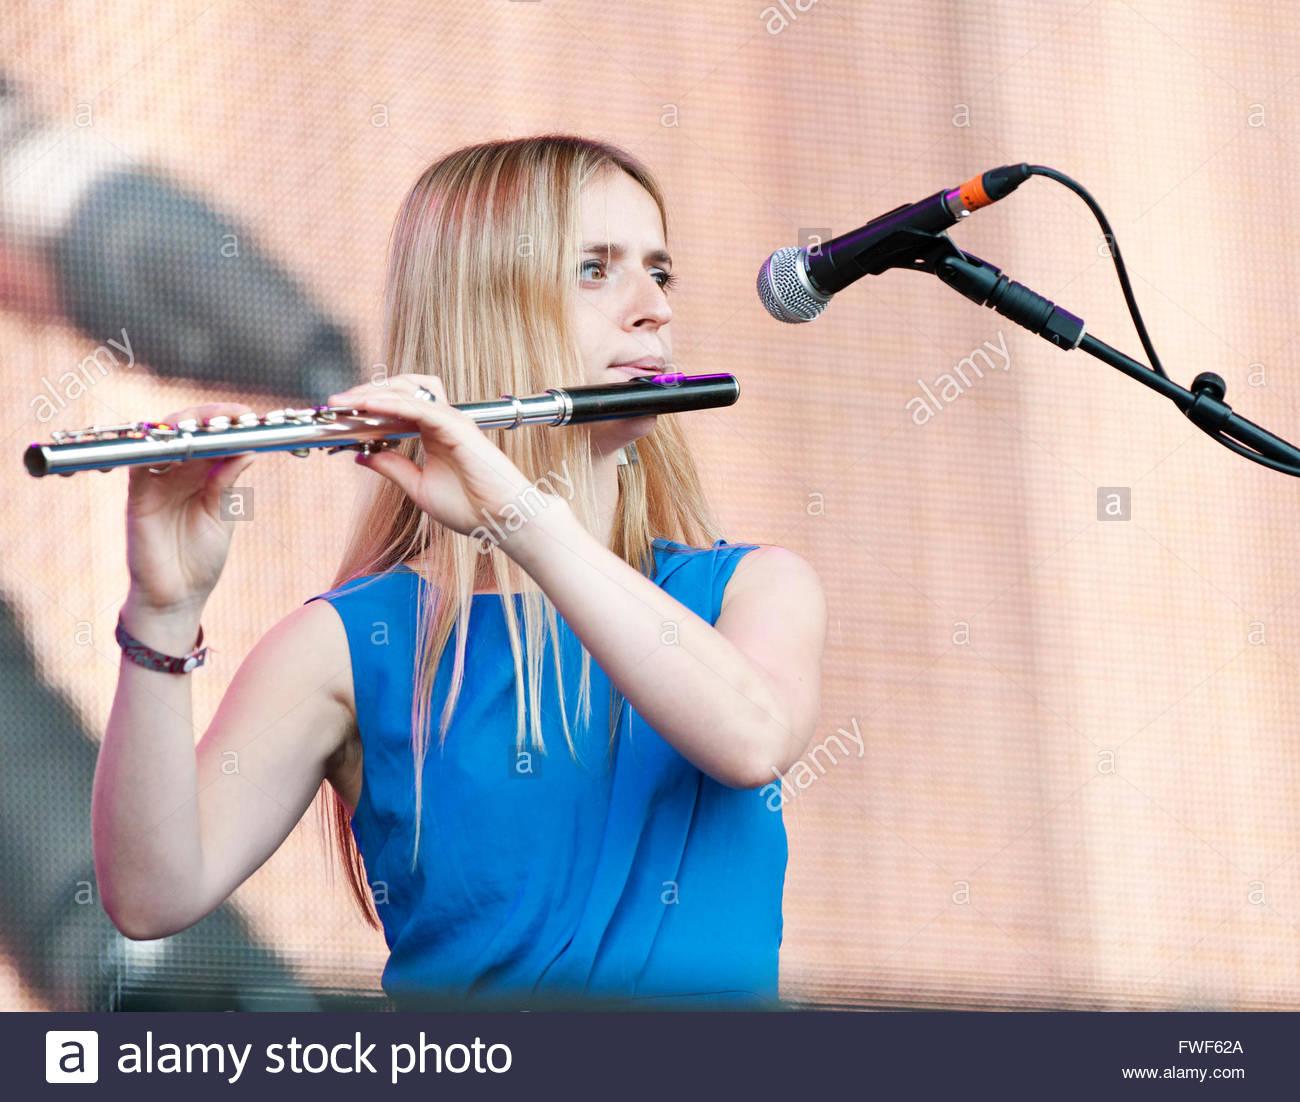 Lillas Kinsman-Blake of The Shee at Fairport's Cropredy festival, UK, 2011. - Stock Image